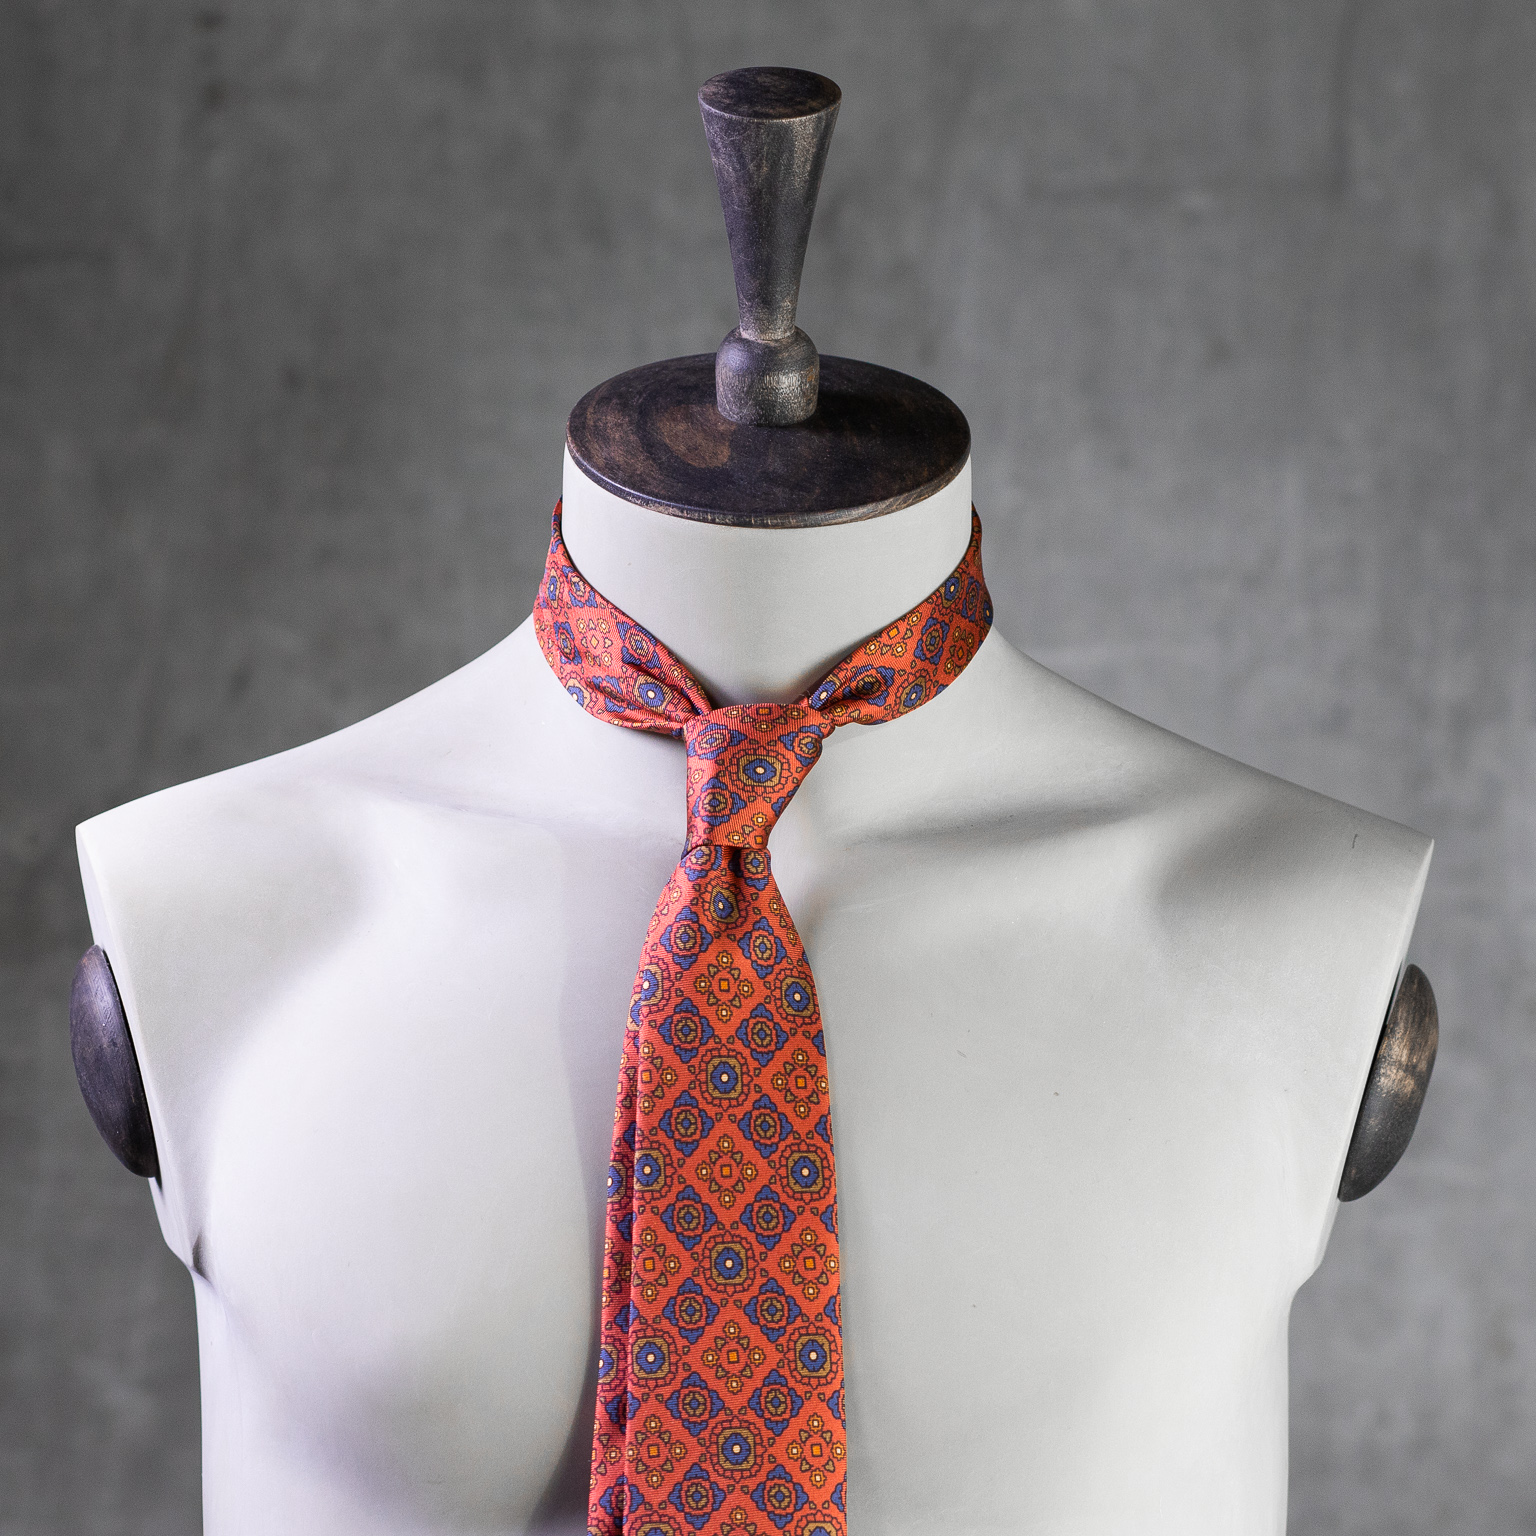 PRINTED-SILK-SEDA-ESTAMPADA-0580-Tie-Initials-Corbata-Iniciales-The-Seëlk-2